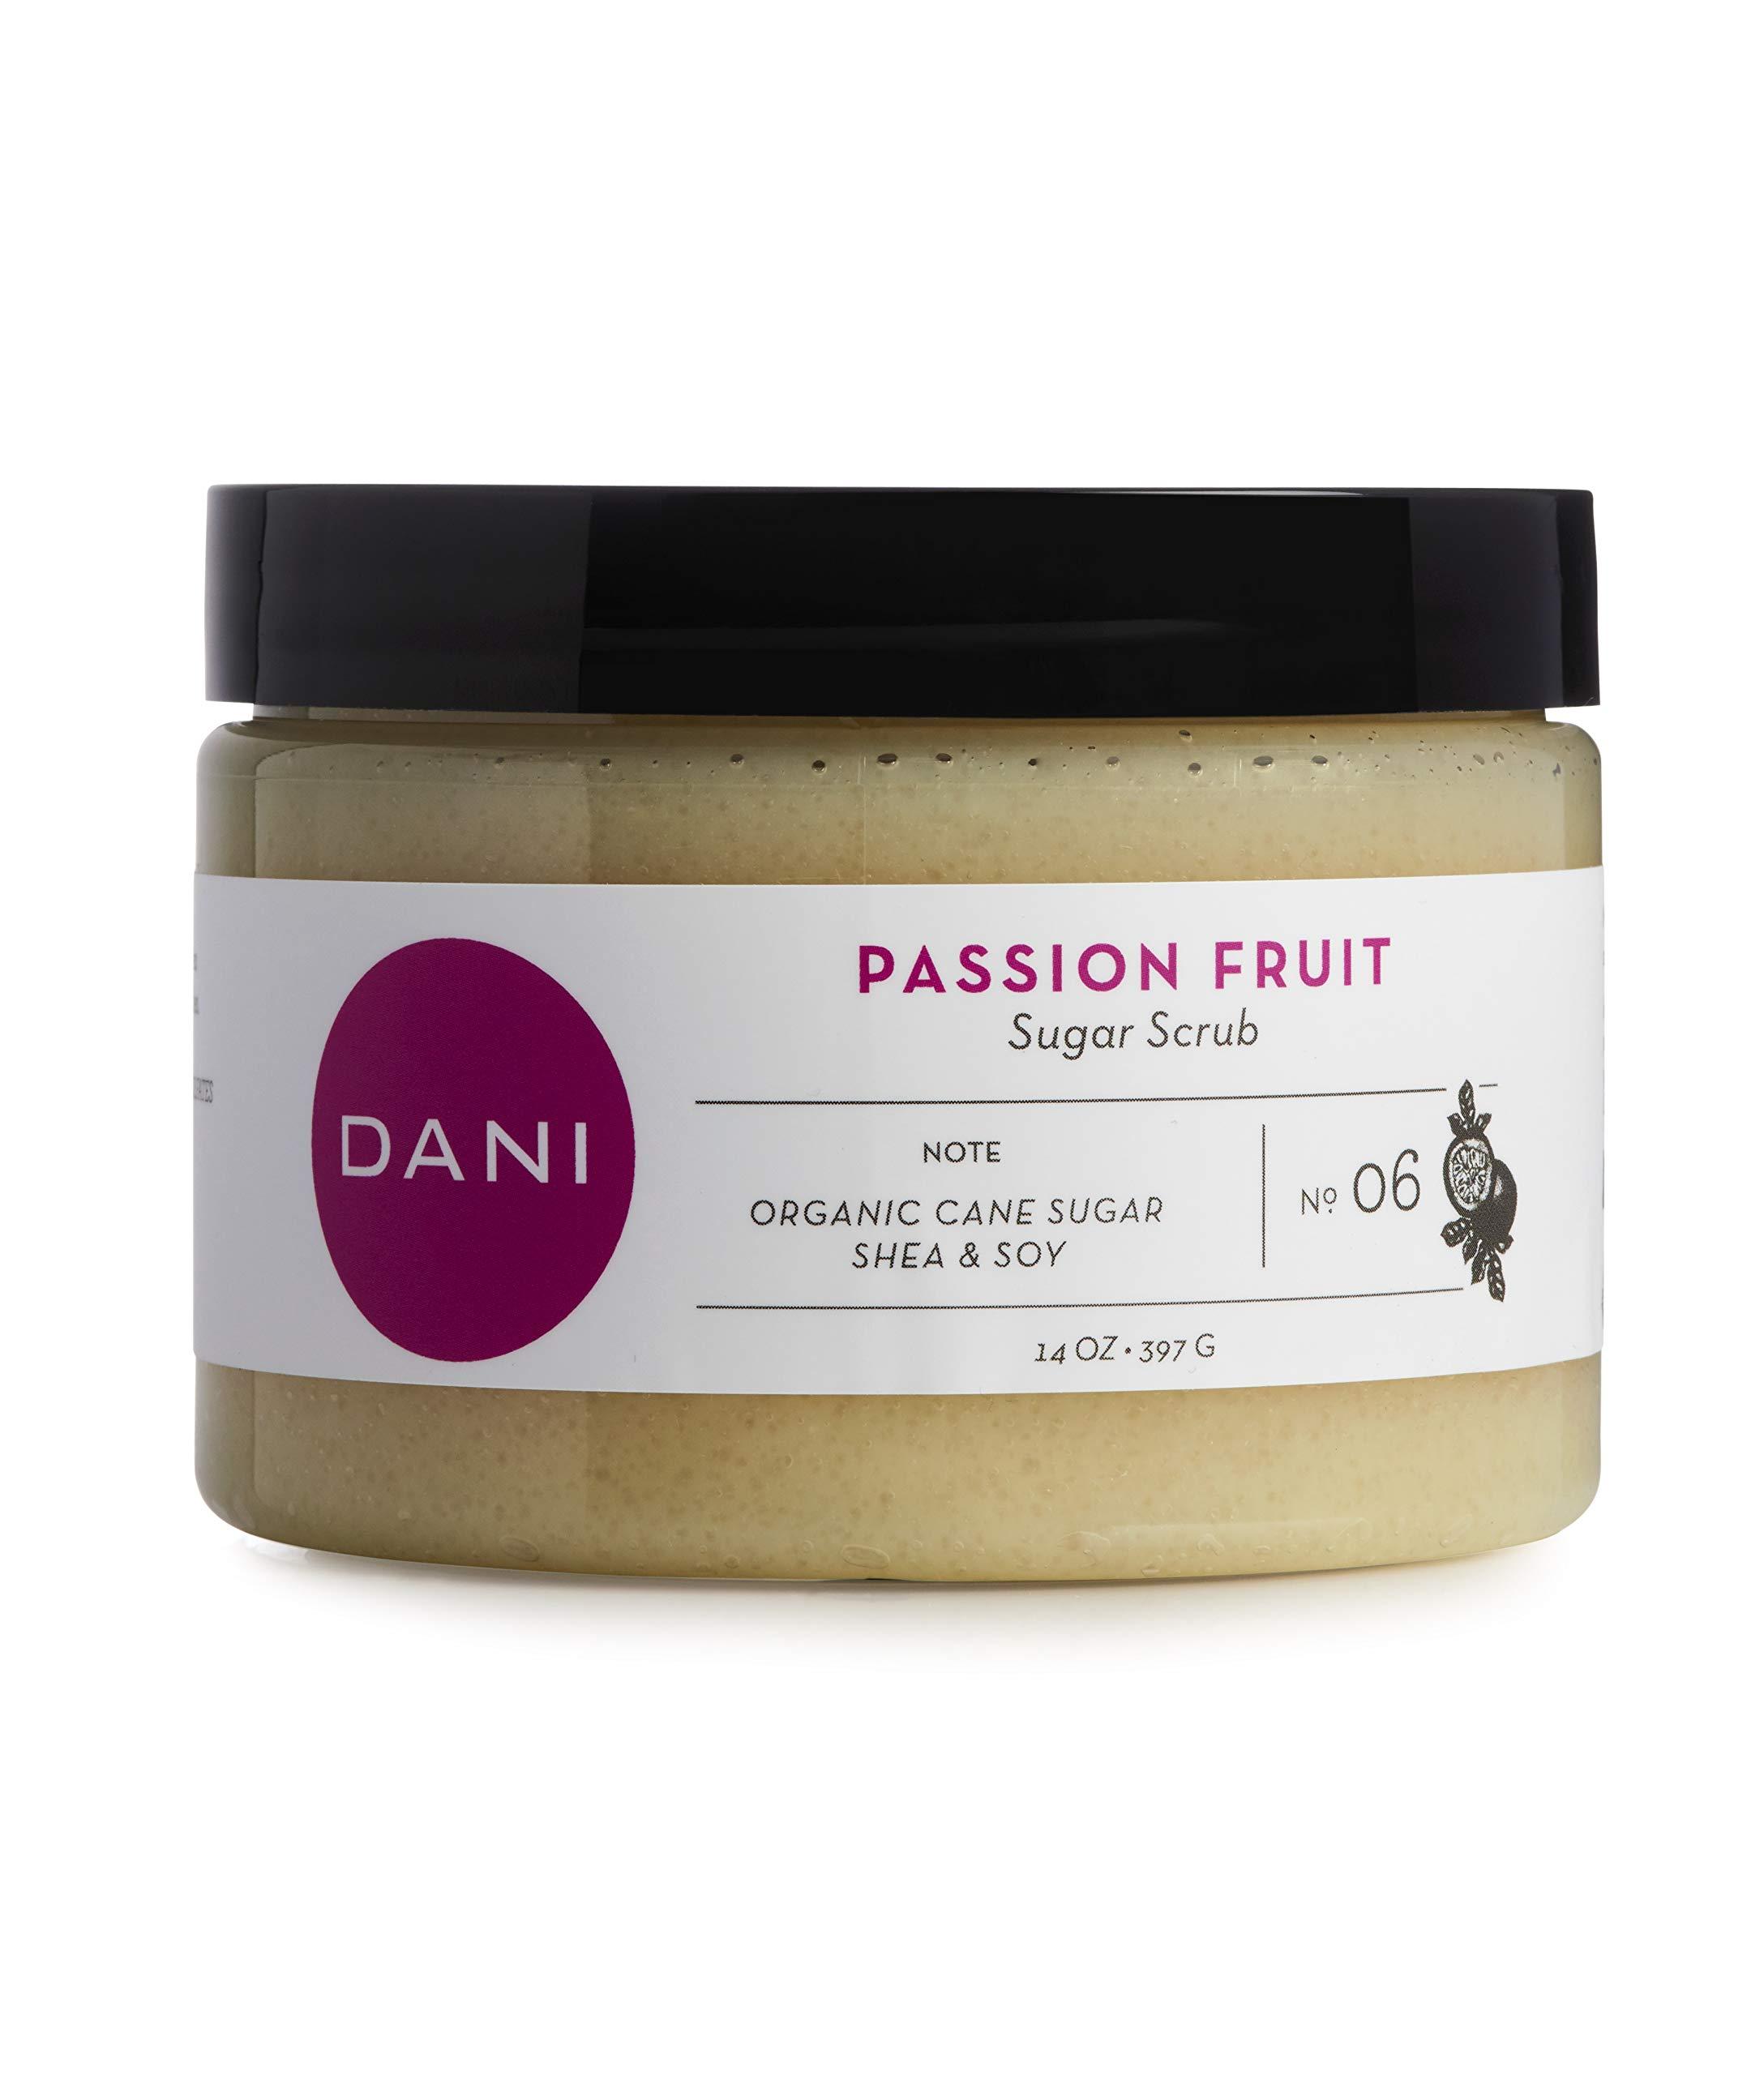 Pure & Gentle Exfoliating Sugar Scrub by DANI Naturals - Juicy Passion Fruit Scented Body Polish - Organic Cane Sugar & Natural Moisturizing Shea Butter - 14 Ounces